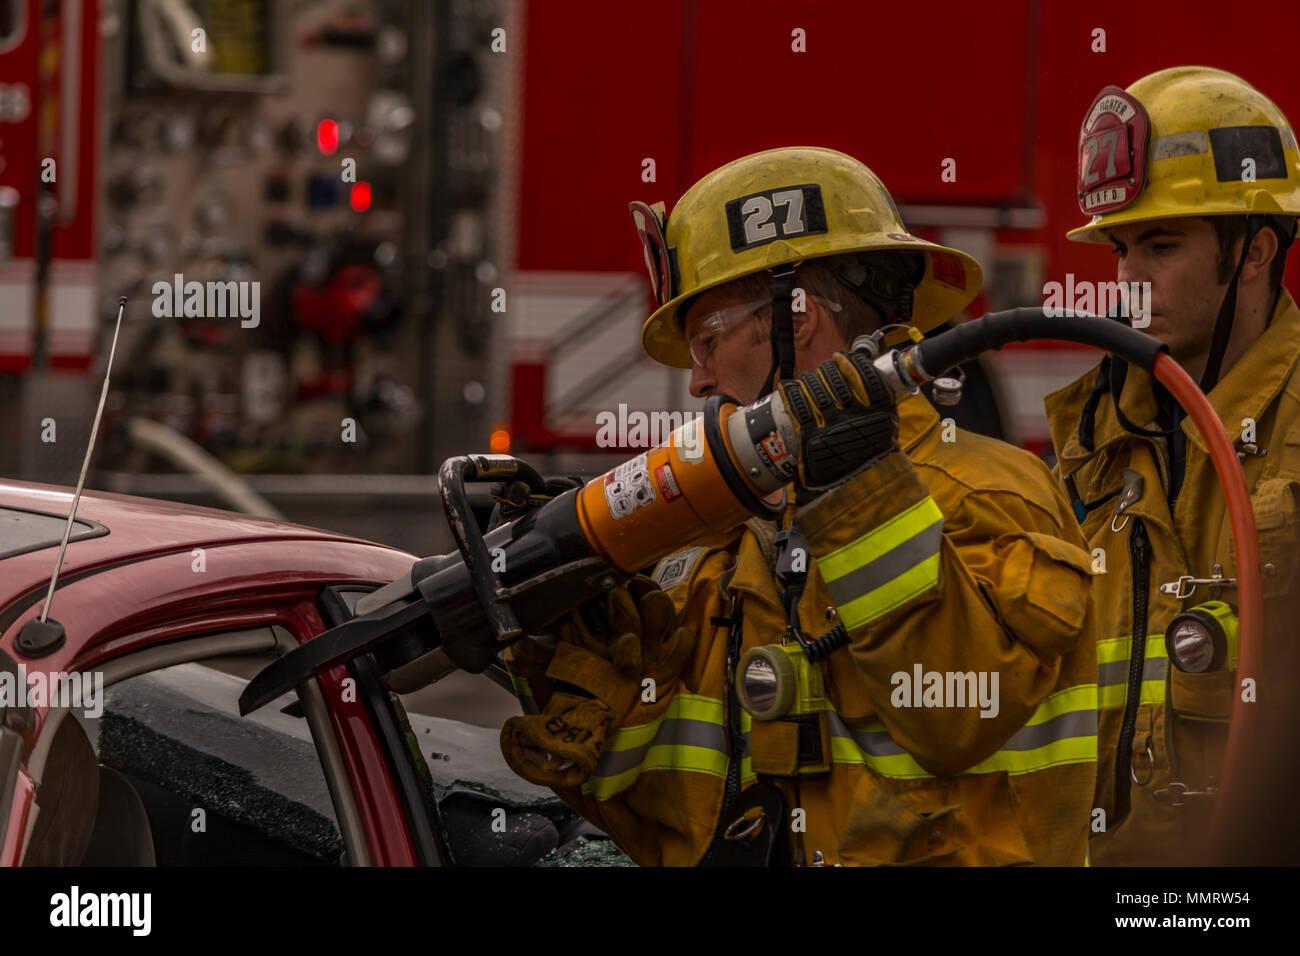 Los Angeles, California, USA 12 May 2018 A Los Angeles City